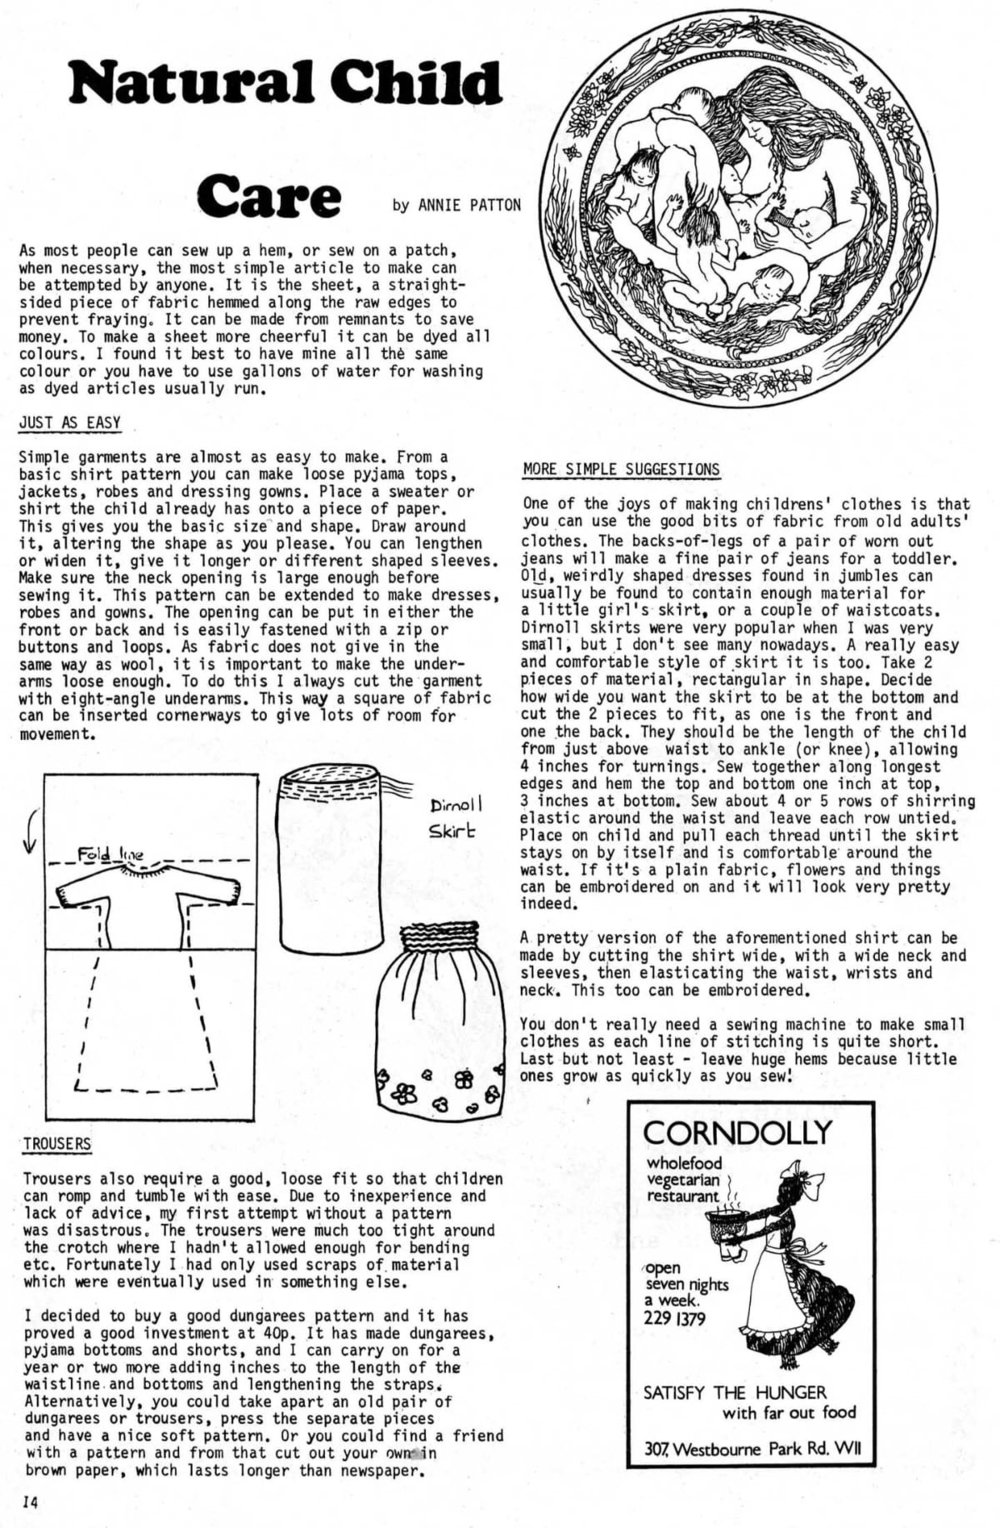 seed-v4-n1-jan1975-14.jpg